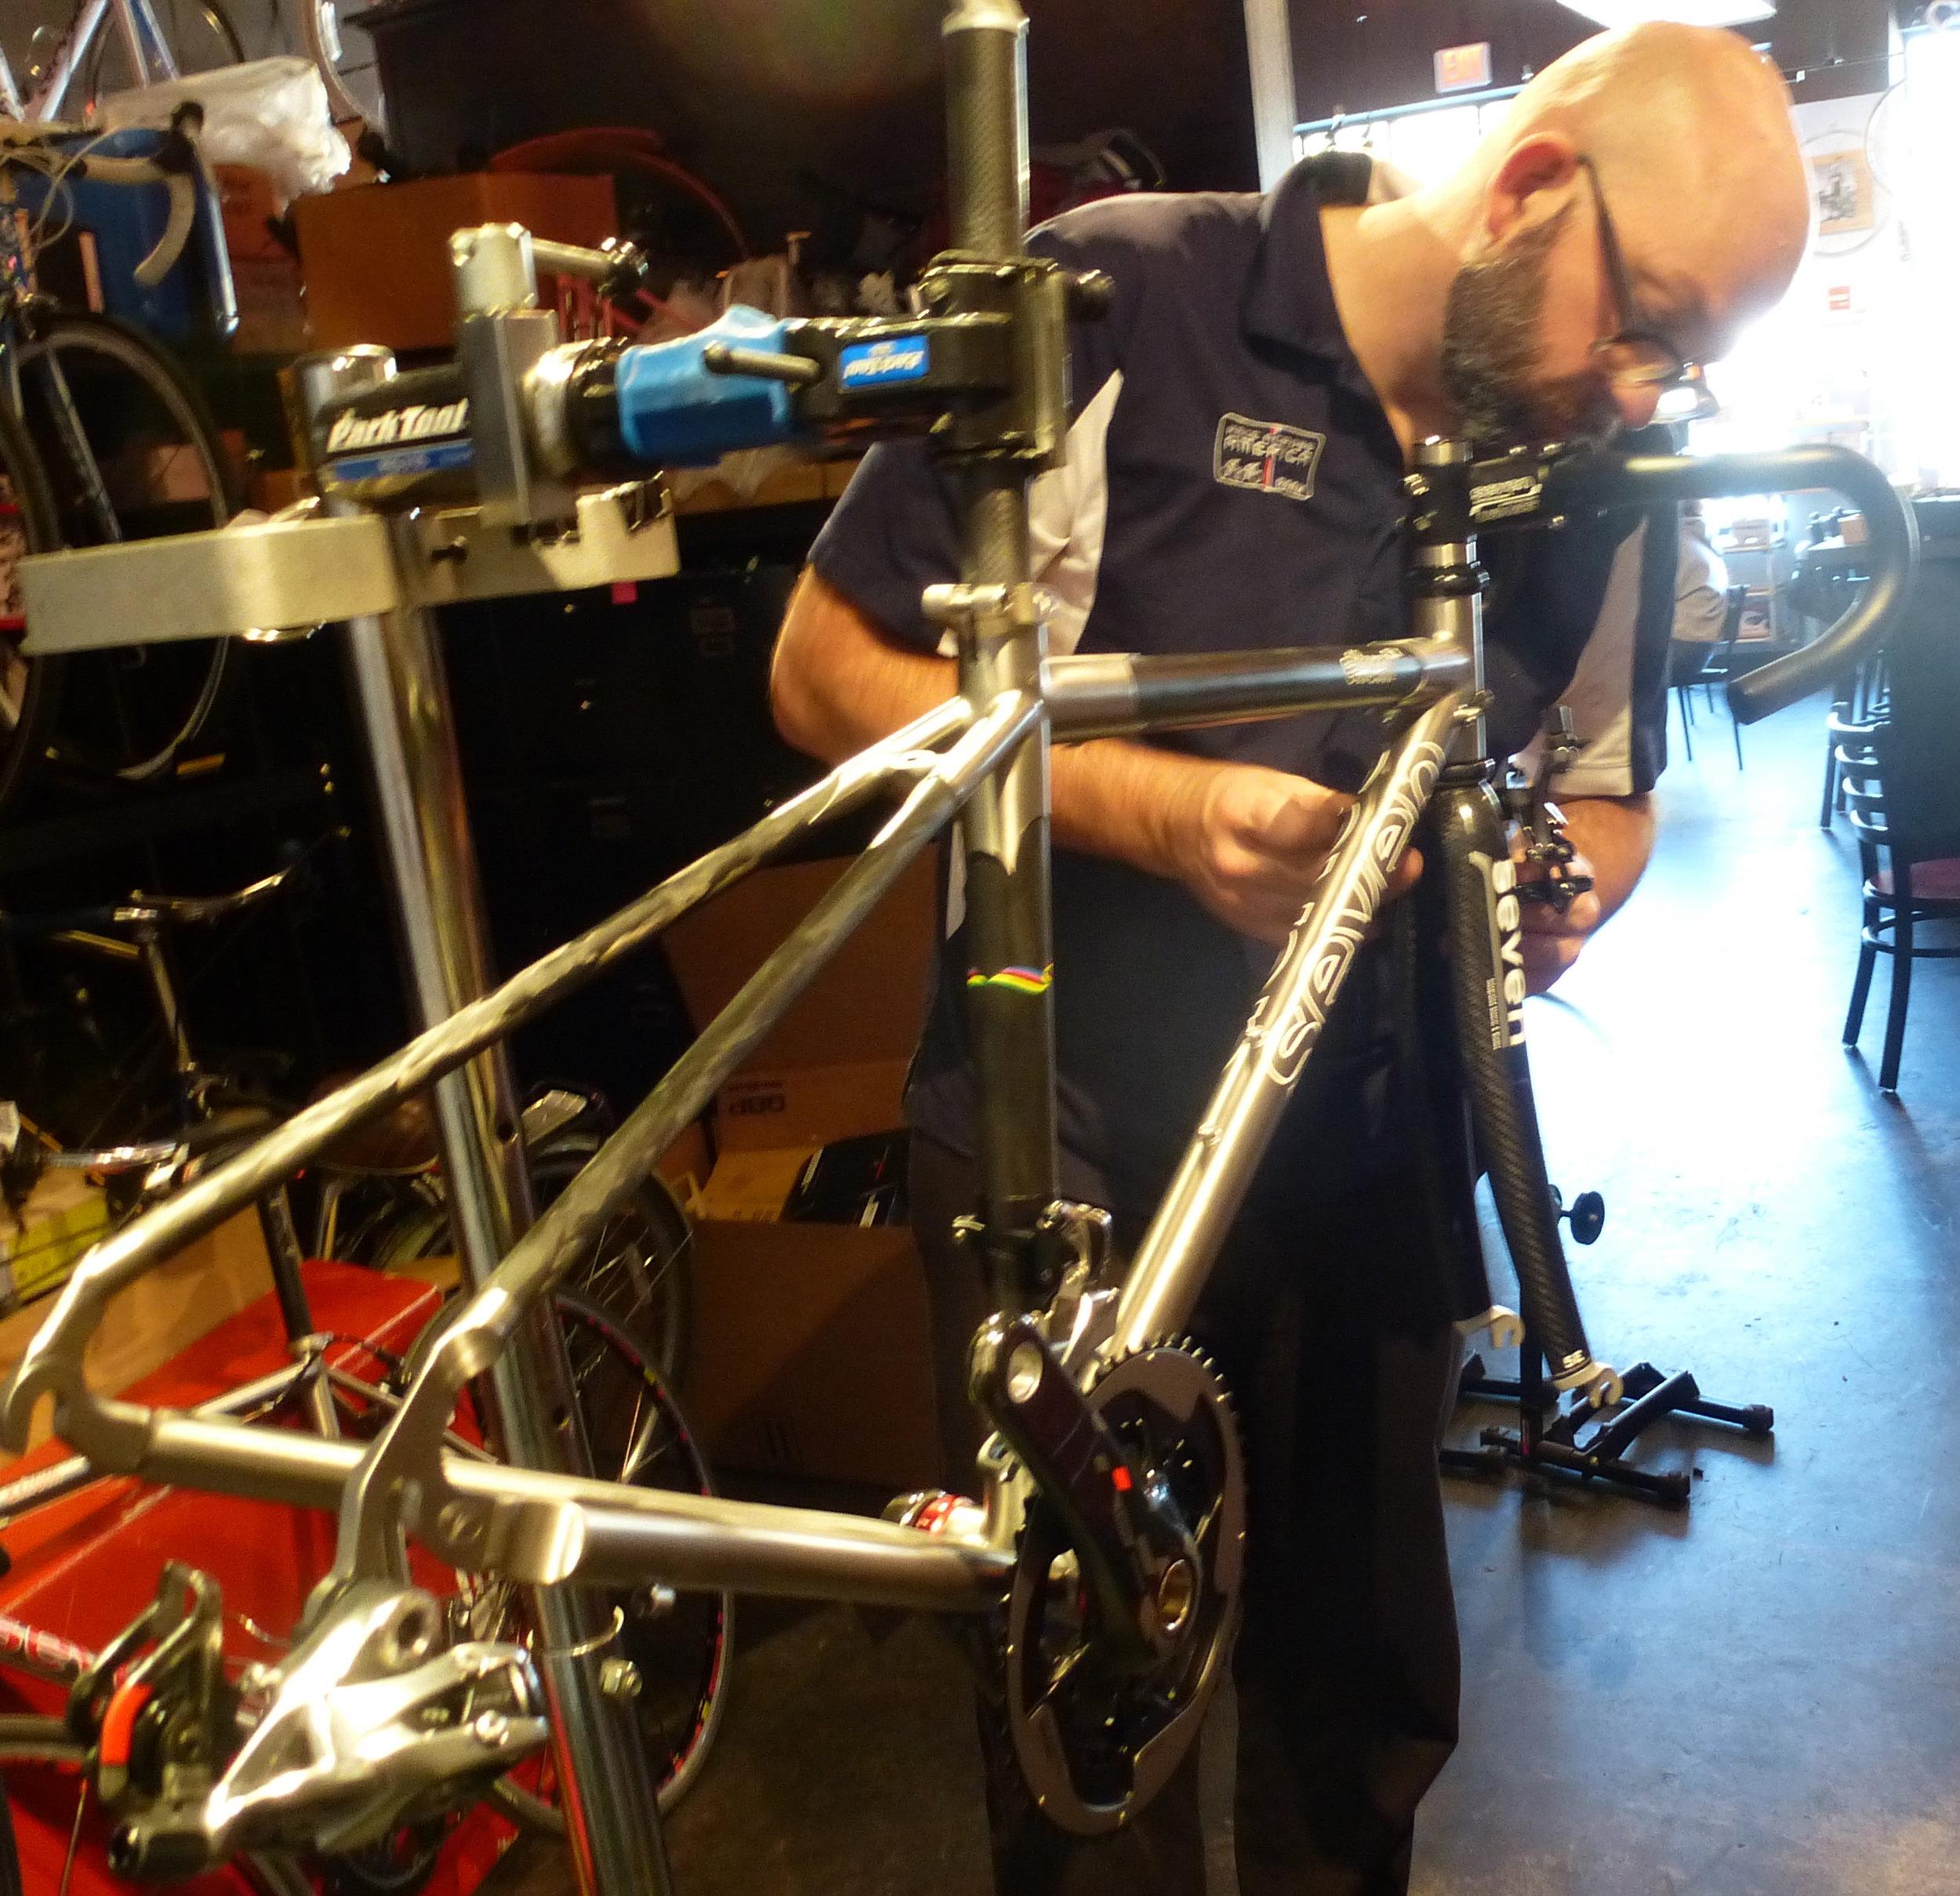 A bike in the build process.